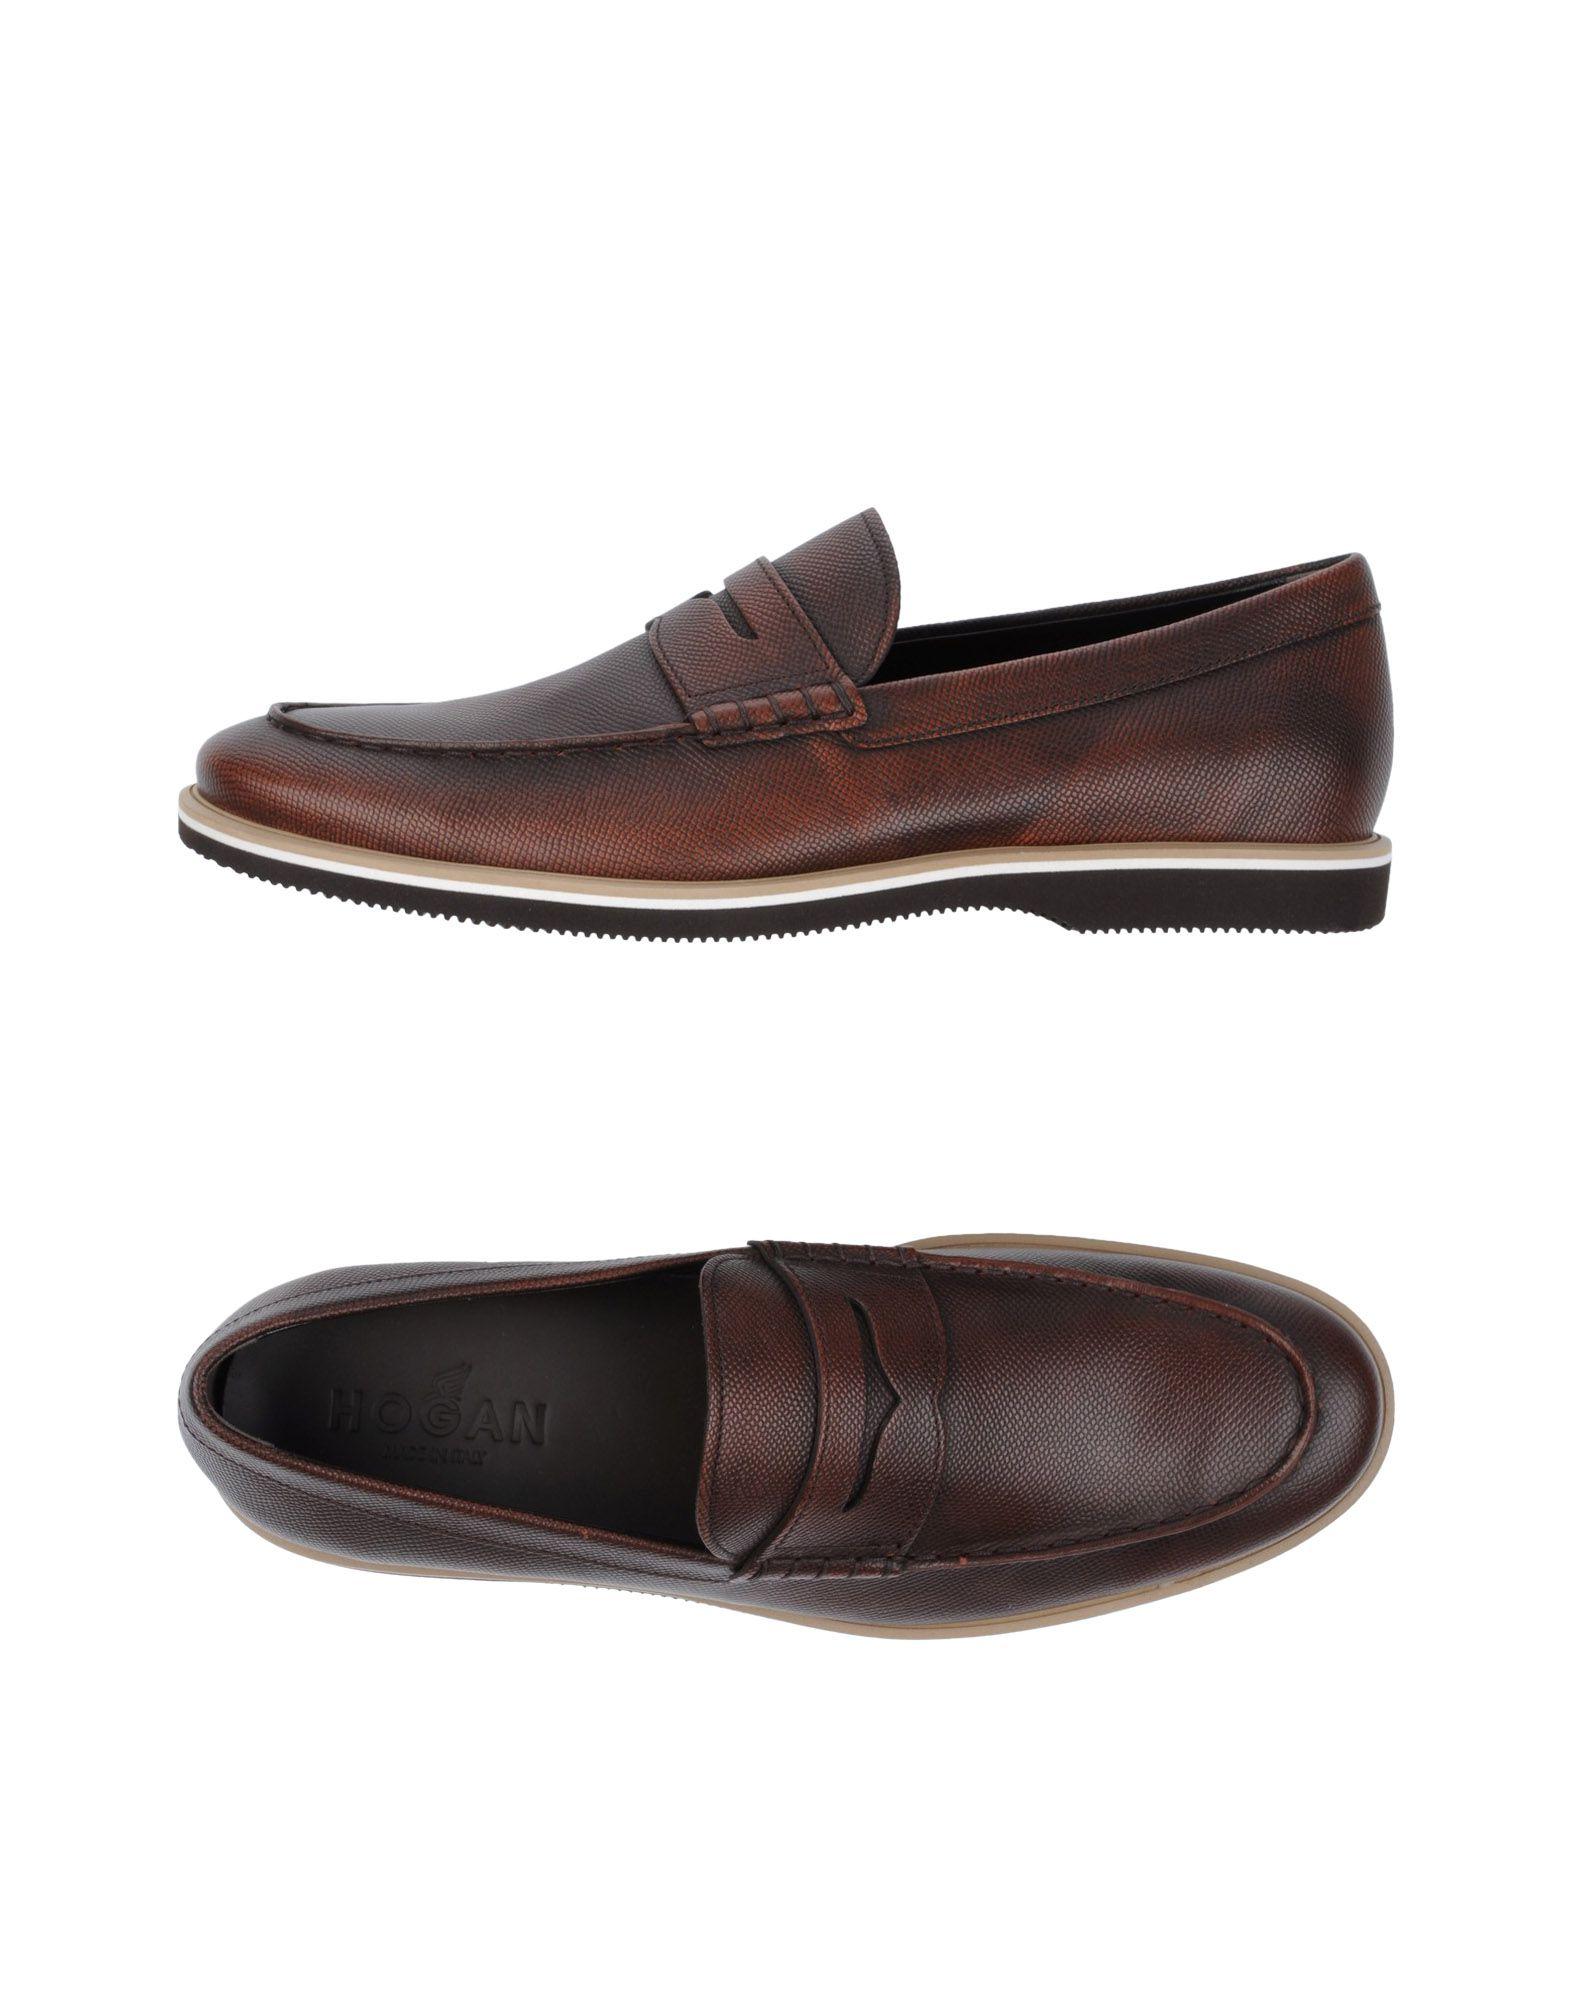 Hogan Mokassins Herren Heiße  11299238IV Heiße Herren Schuhe ade9b6